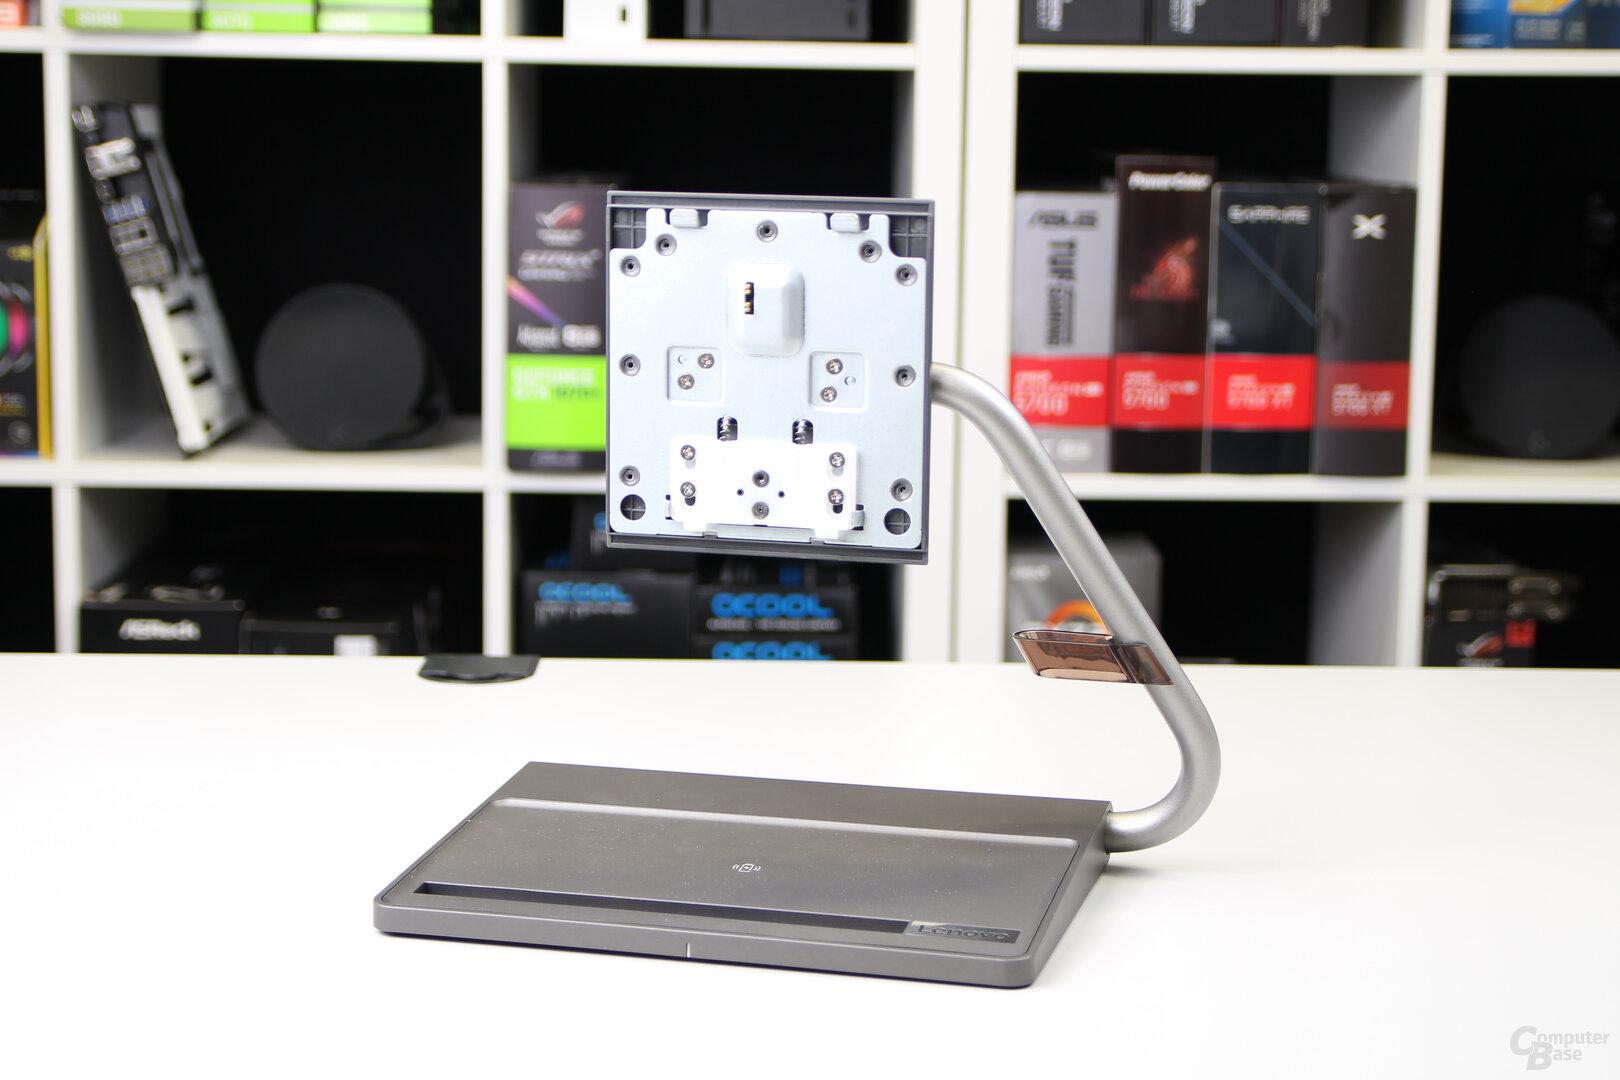 Lenovo Qreator 27: Asymmetrischer Standfuß ohne Ergonomie